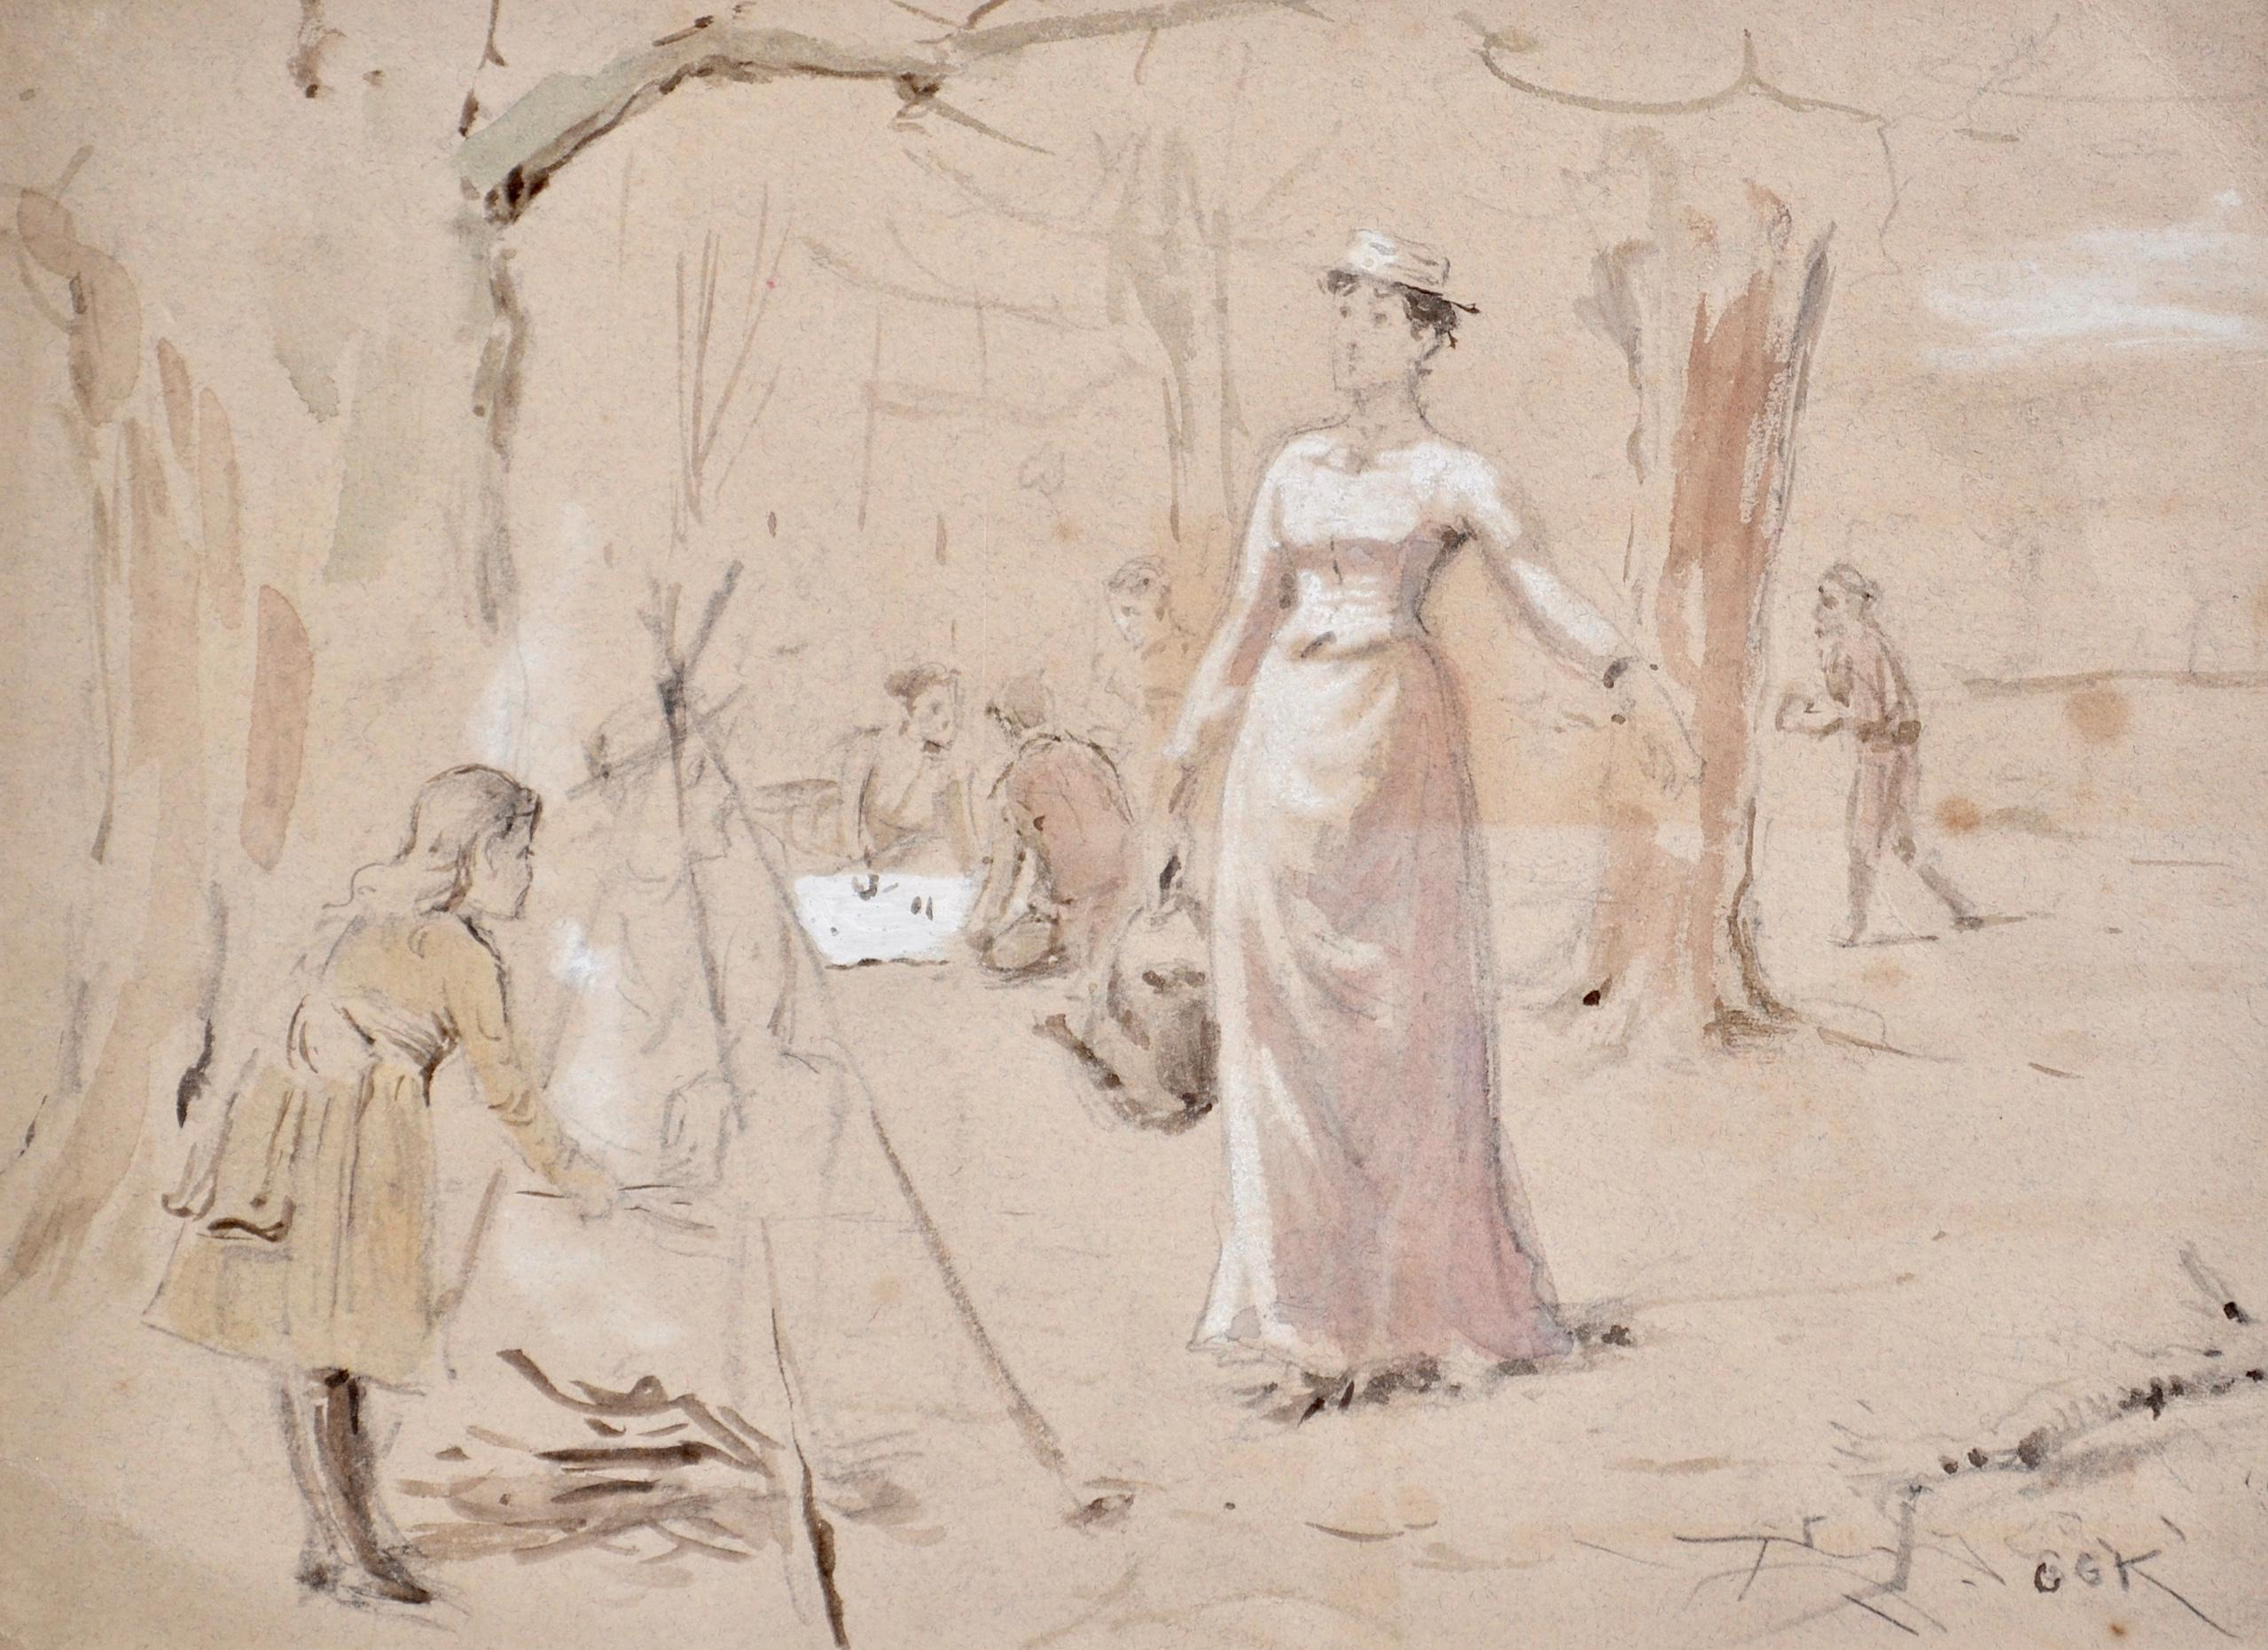 The Family Picnic - Watercolour study by Victorian artist G G Kilburne